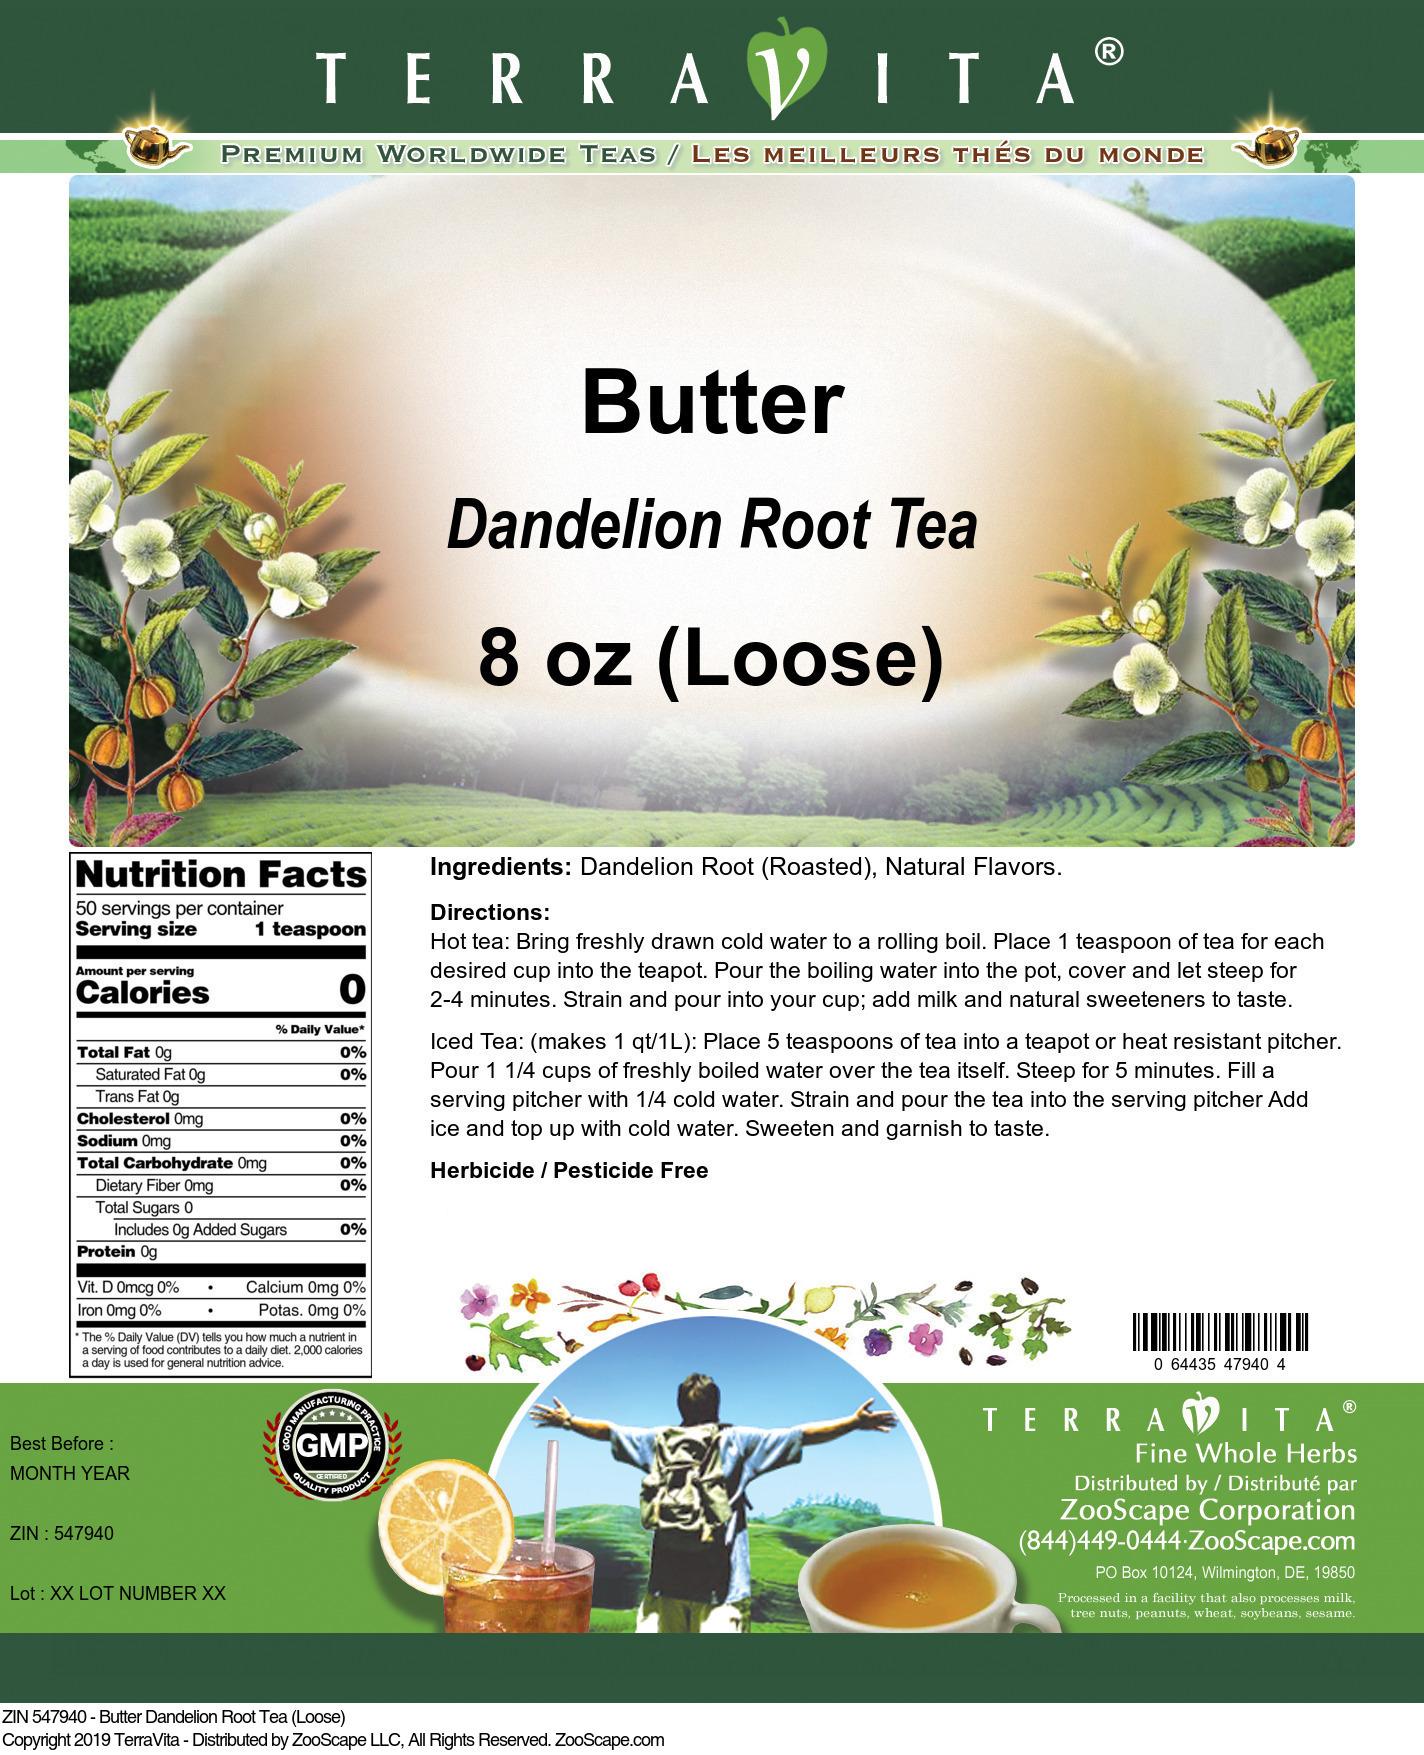 Butter Dandelion Root